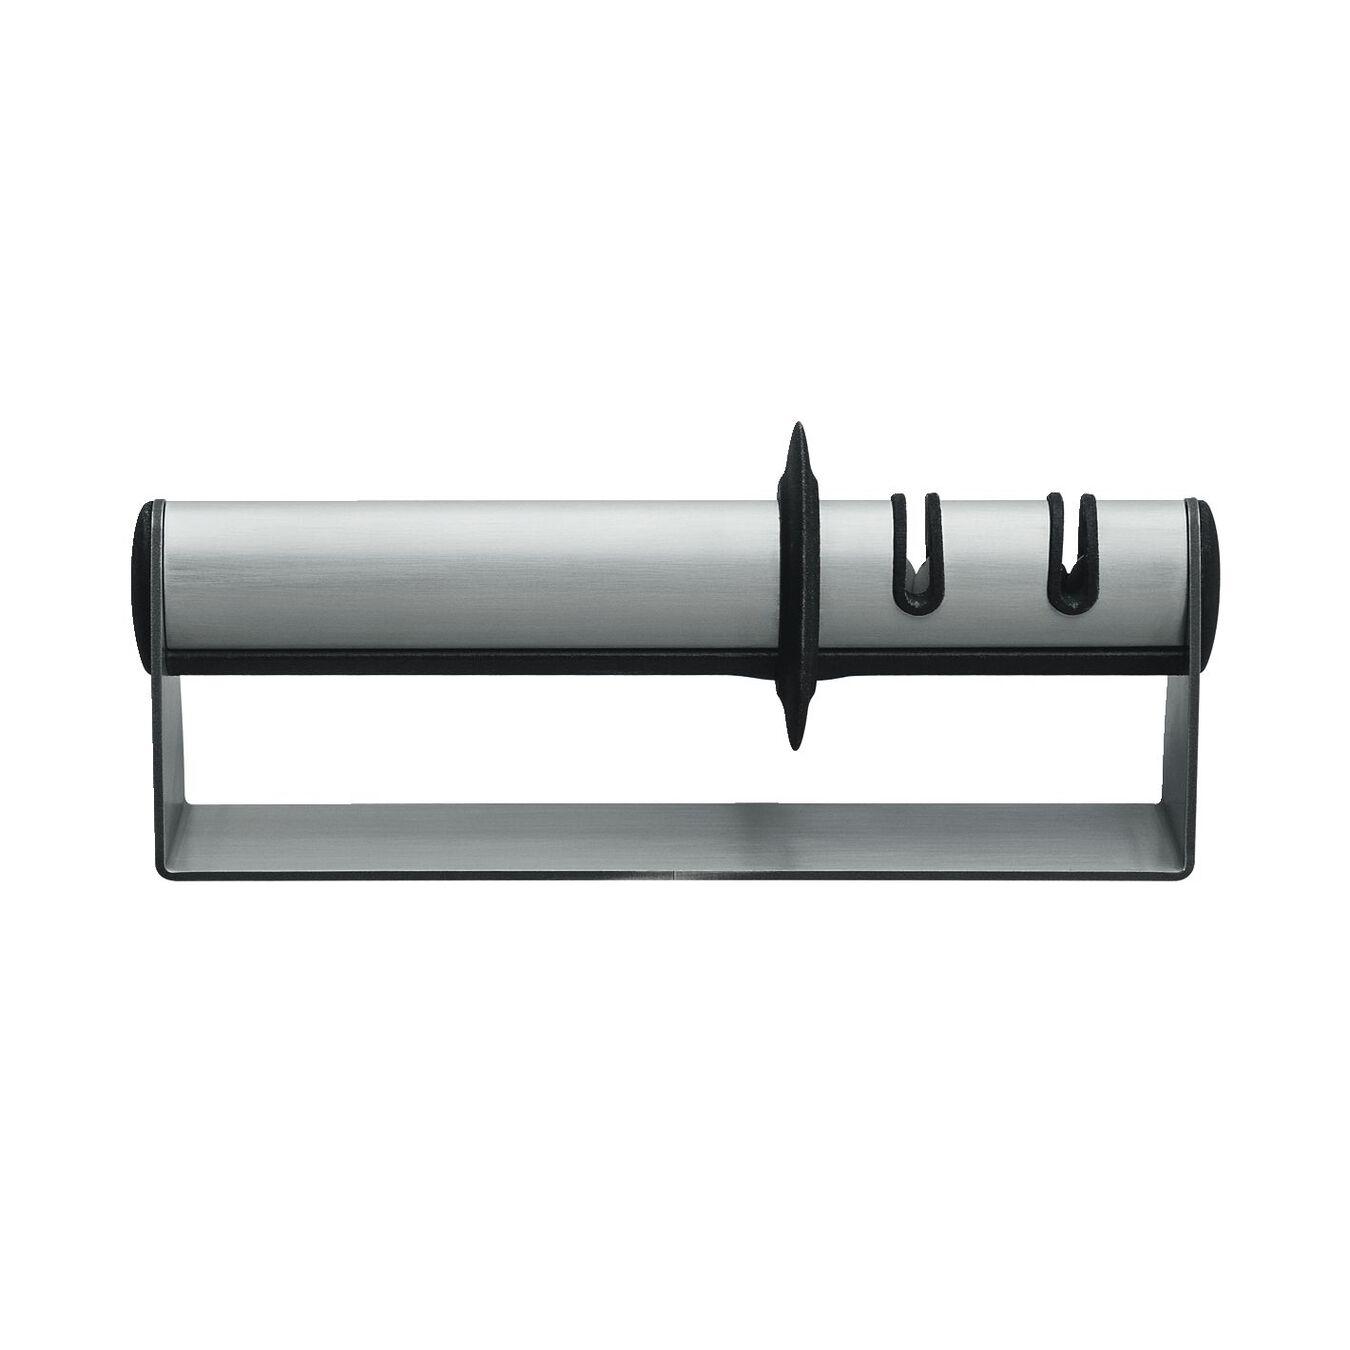 TWINSHARP Select Silber, Edelstahl,,large 1